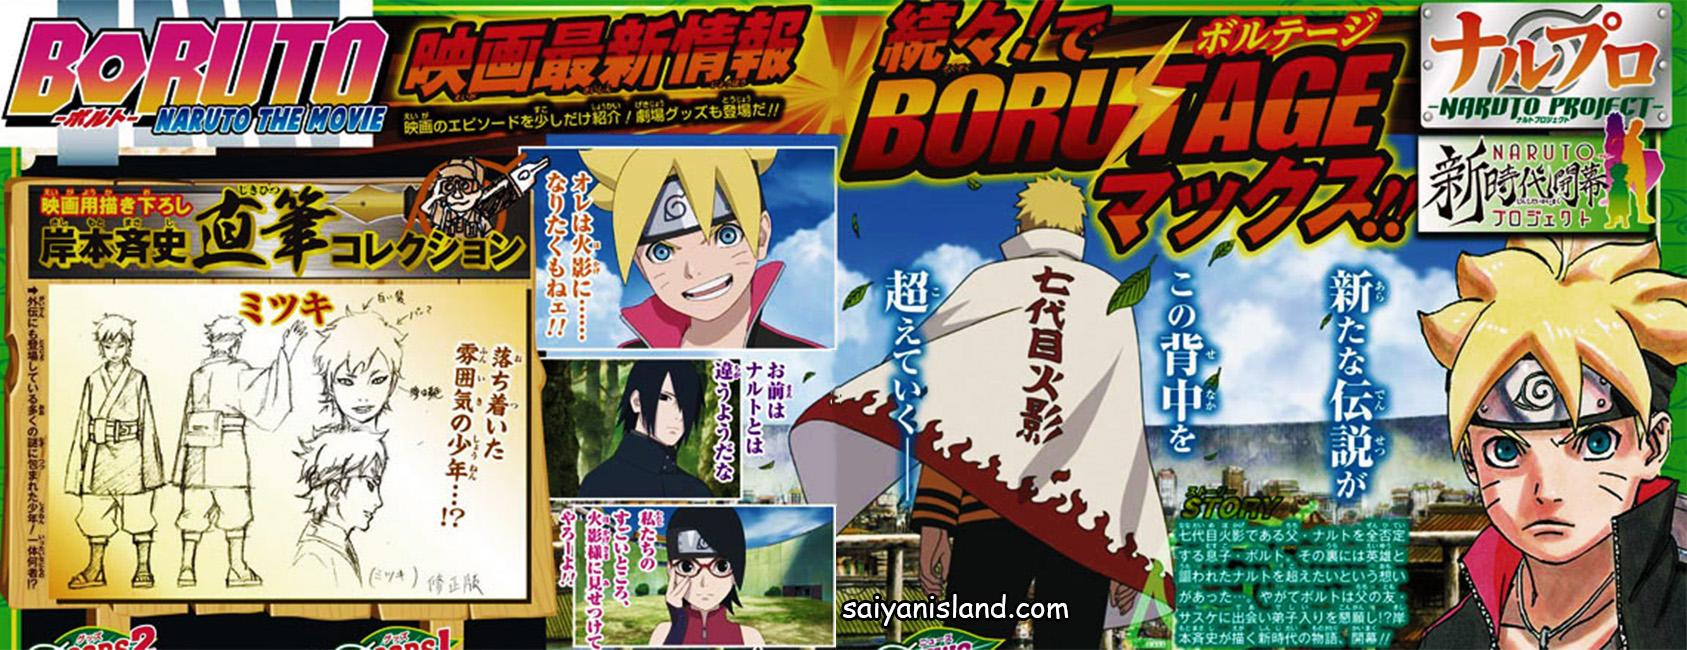 E5quRu0-1 Boruto: Naruto Movie Story Önizleme